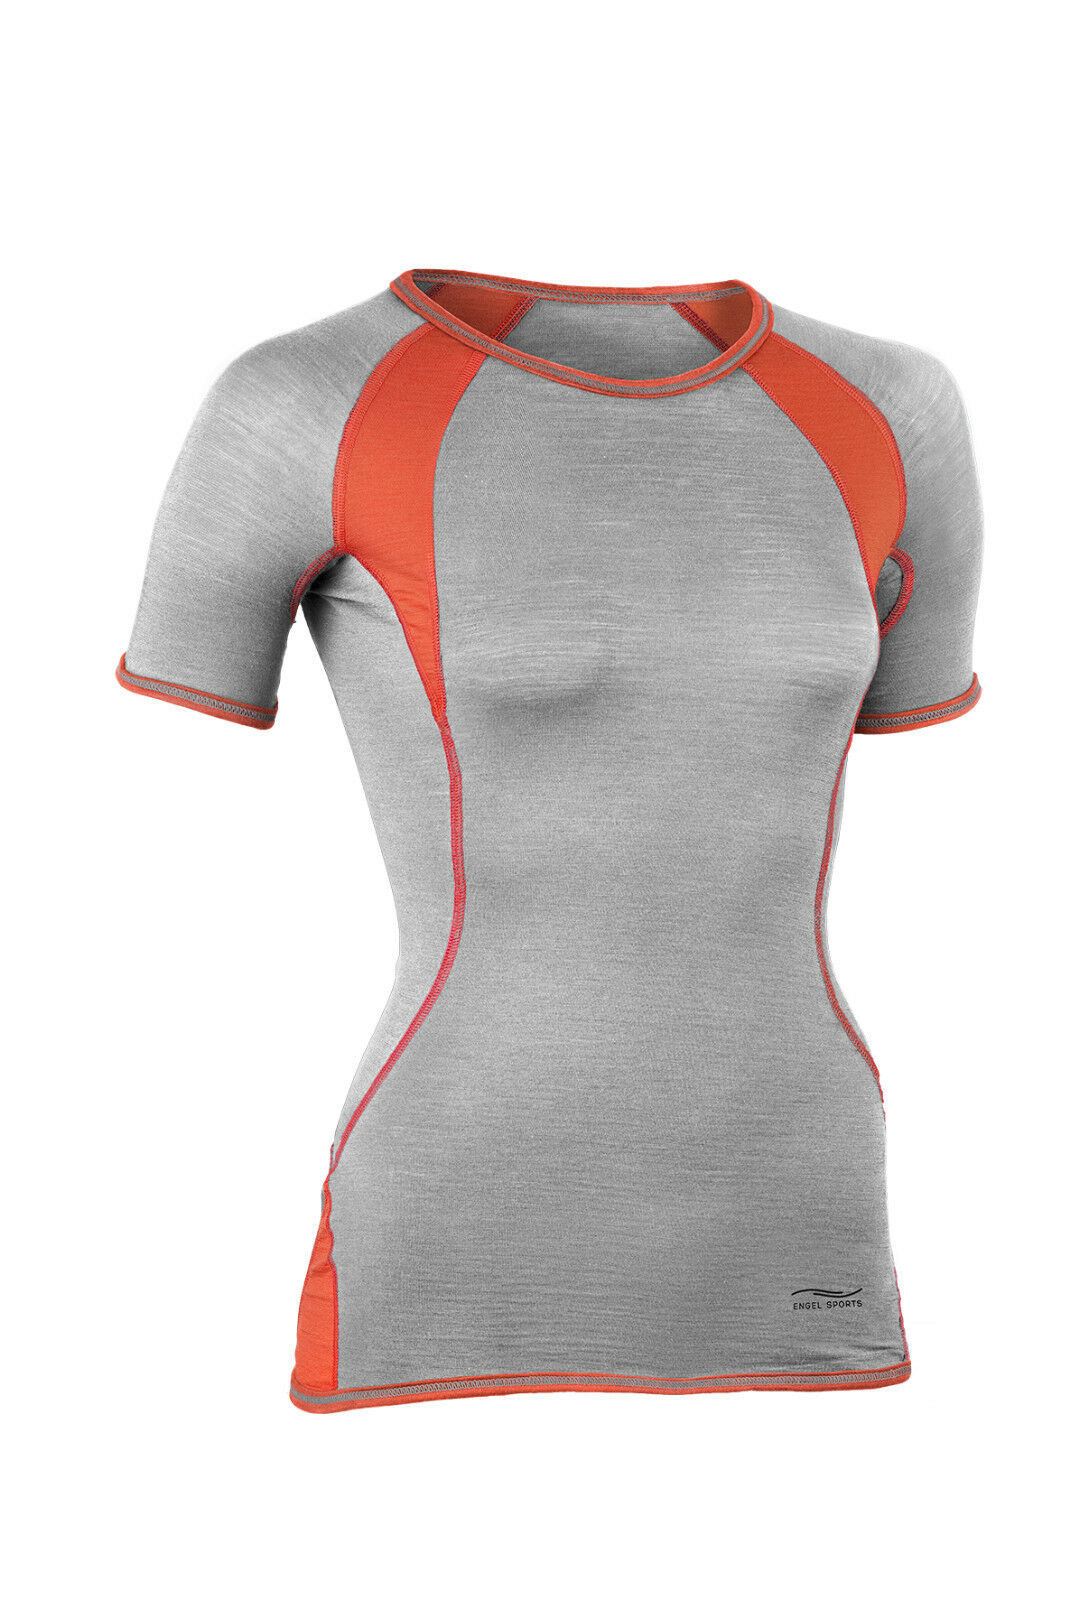 Engel kurzarm Sports Damen Shirt kurzarm Engel ESW150201120 Funktionskleidung GOTS 637f2a